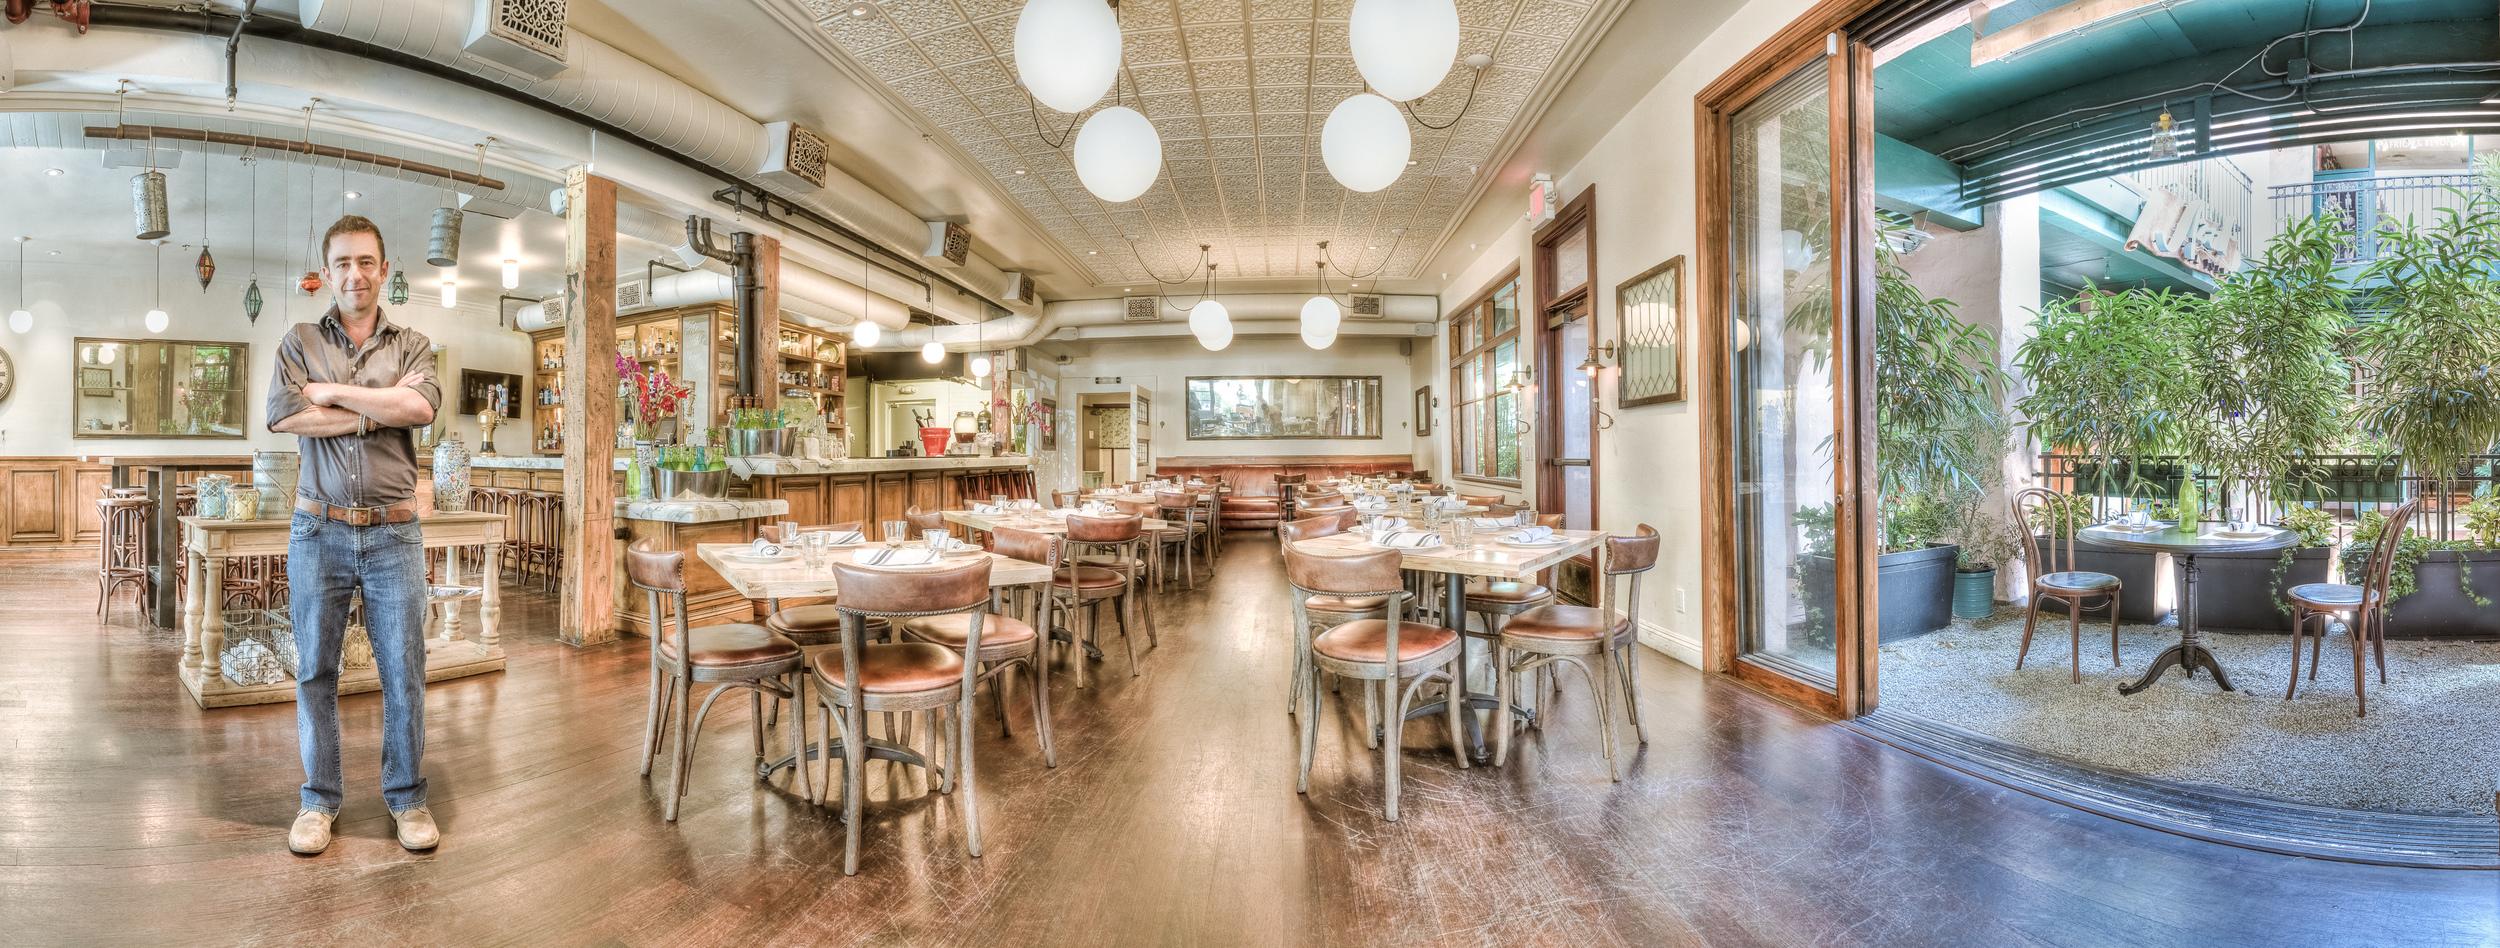 The Hake Kitchen & Bar La Jolla